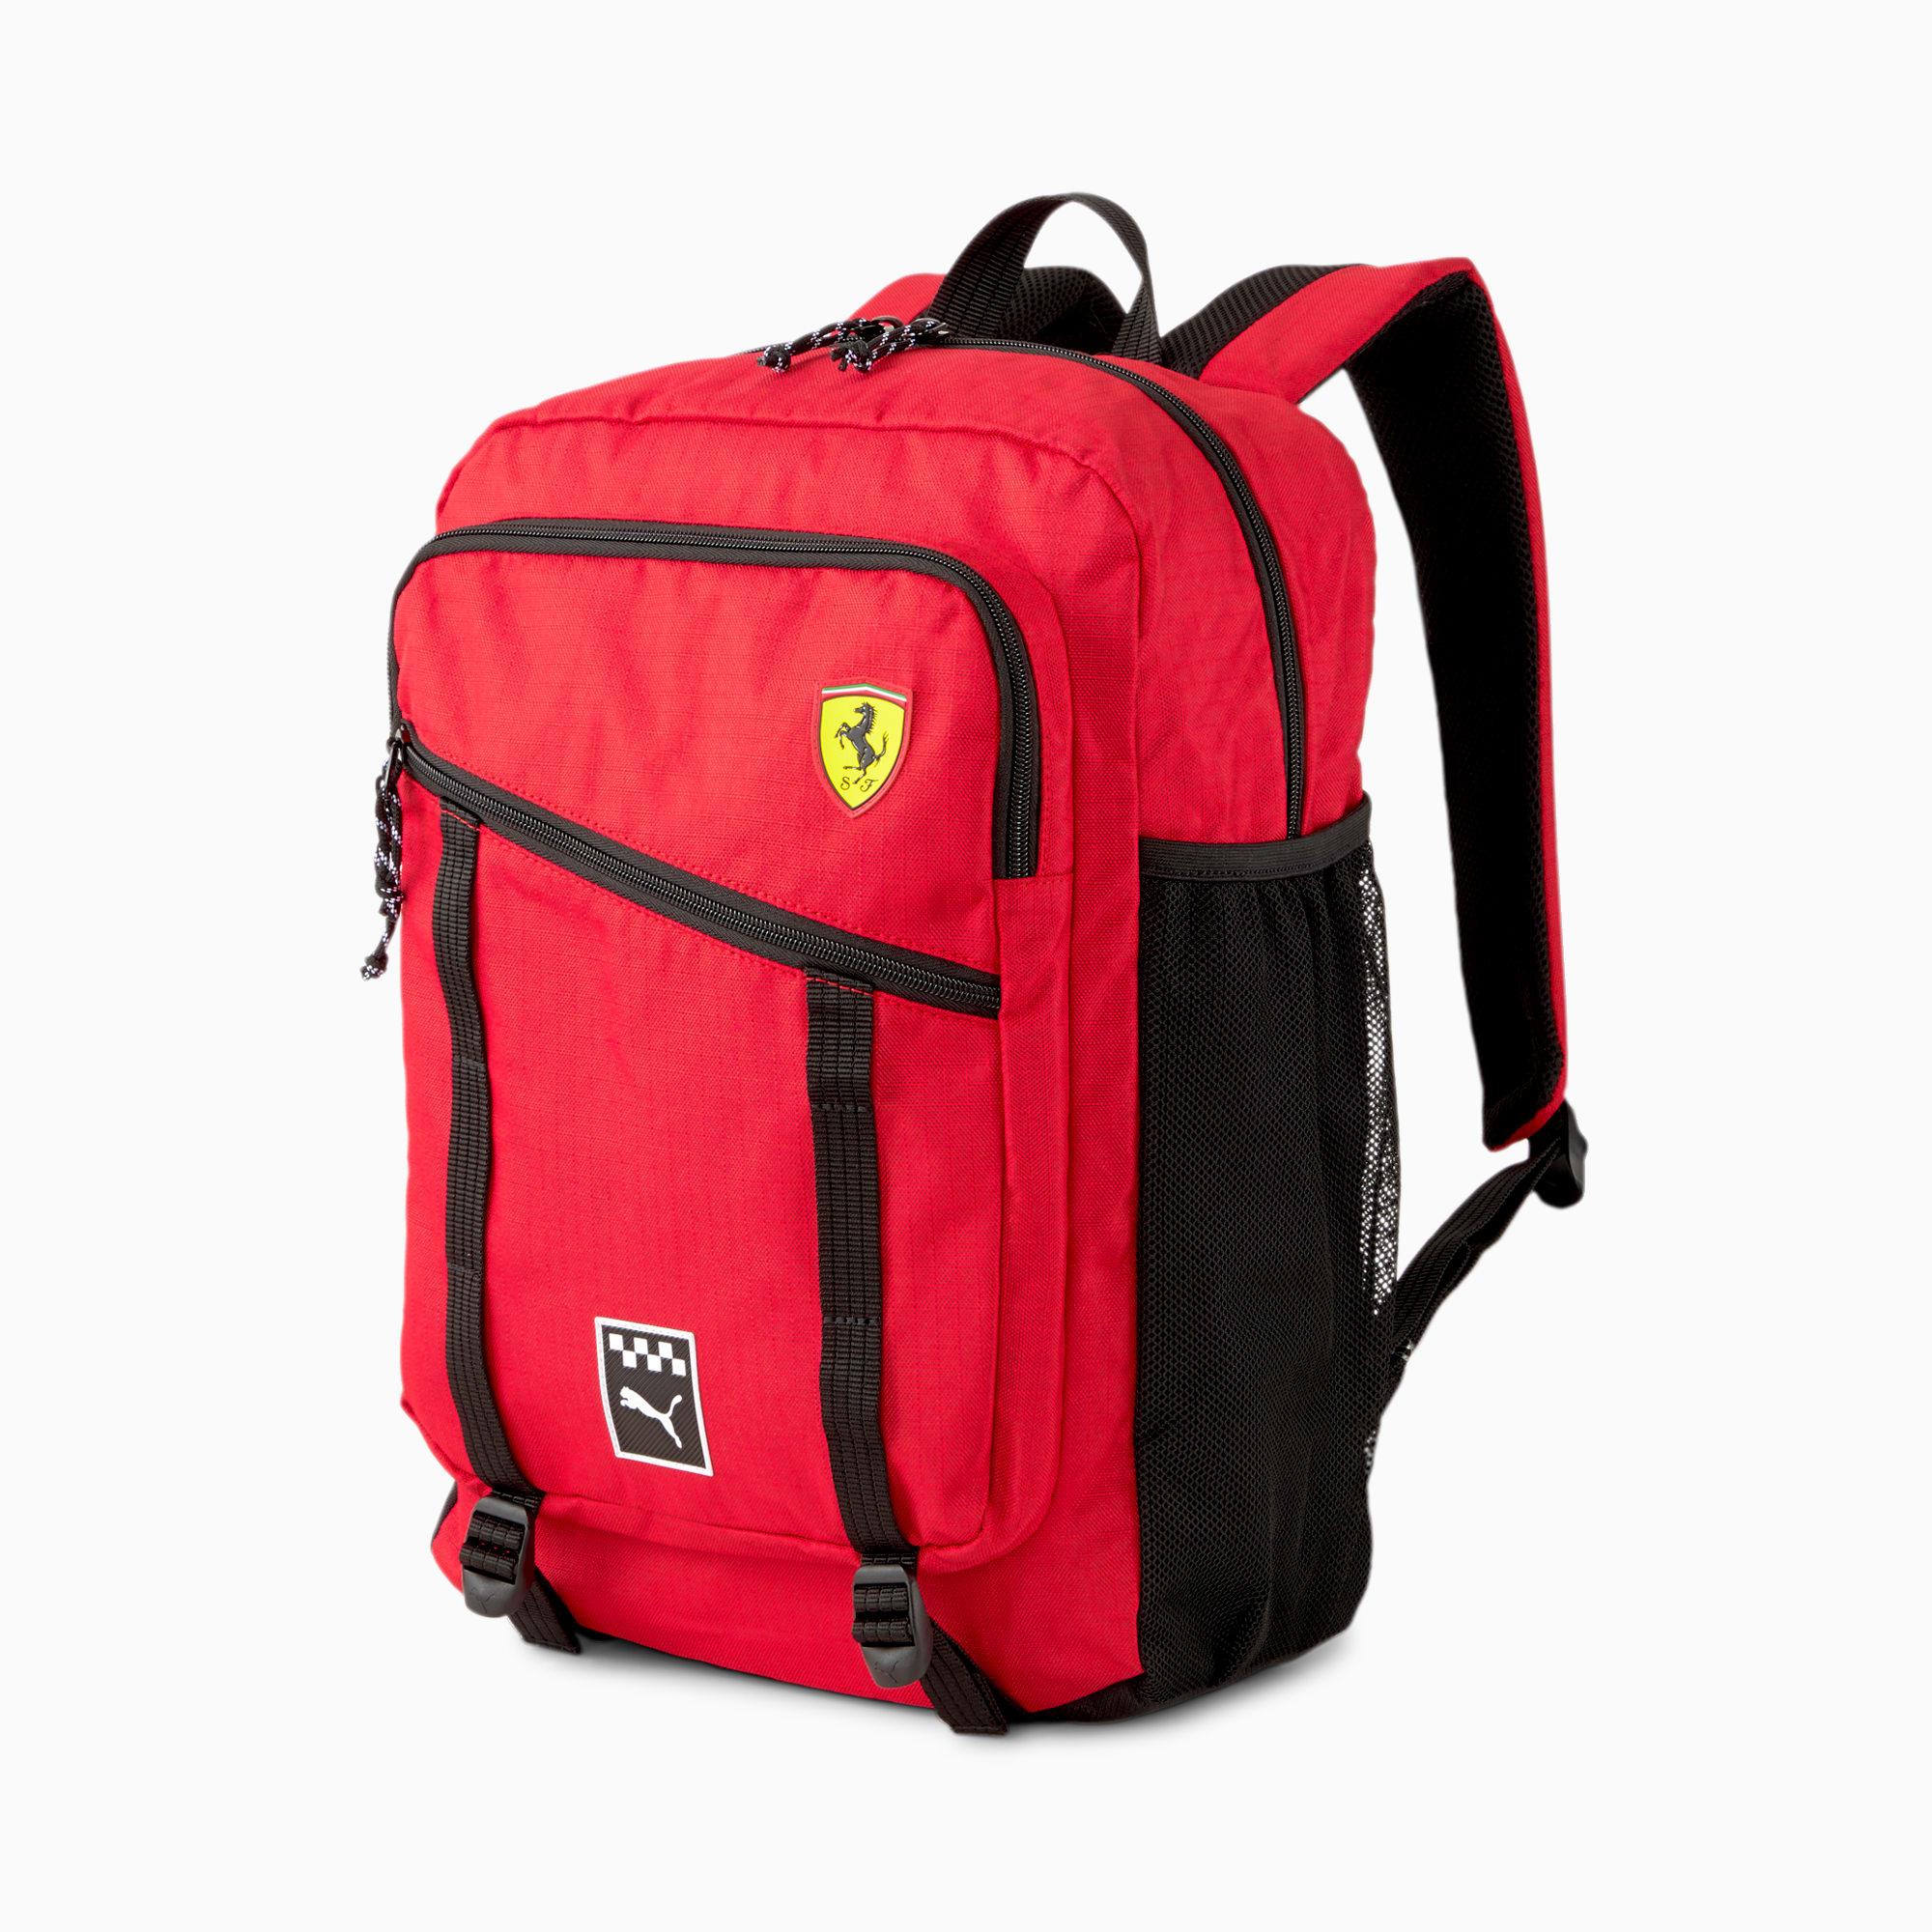 Scuderia Ferrari Backpack Rosso Corsa Puma Mens Styles Puma Germany